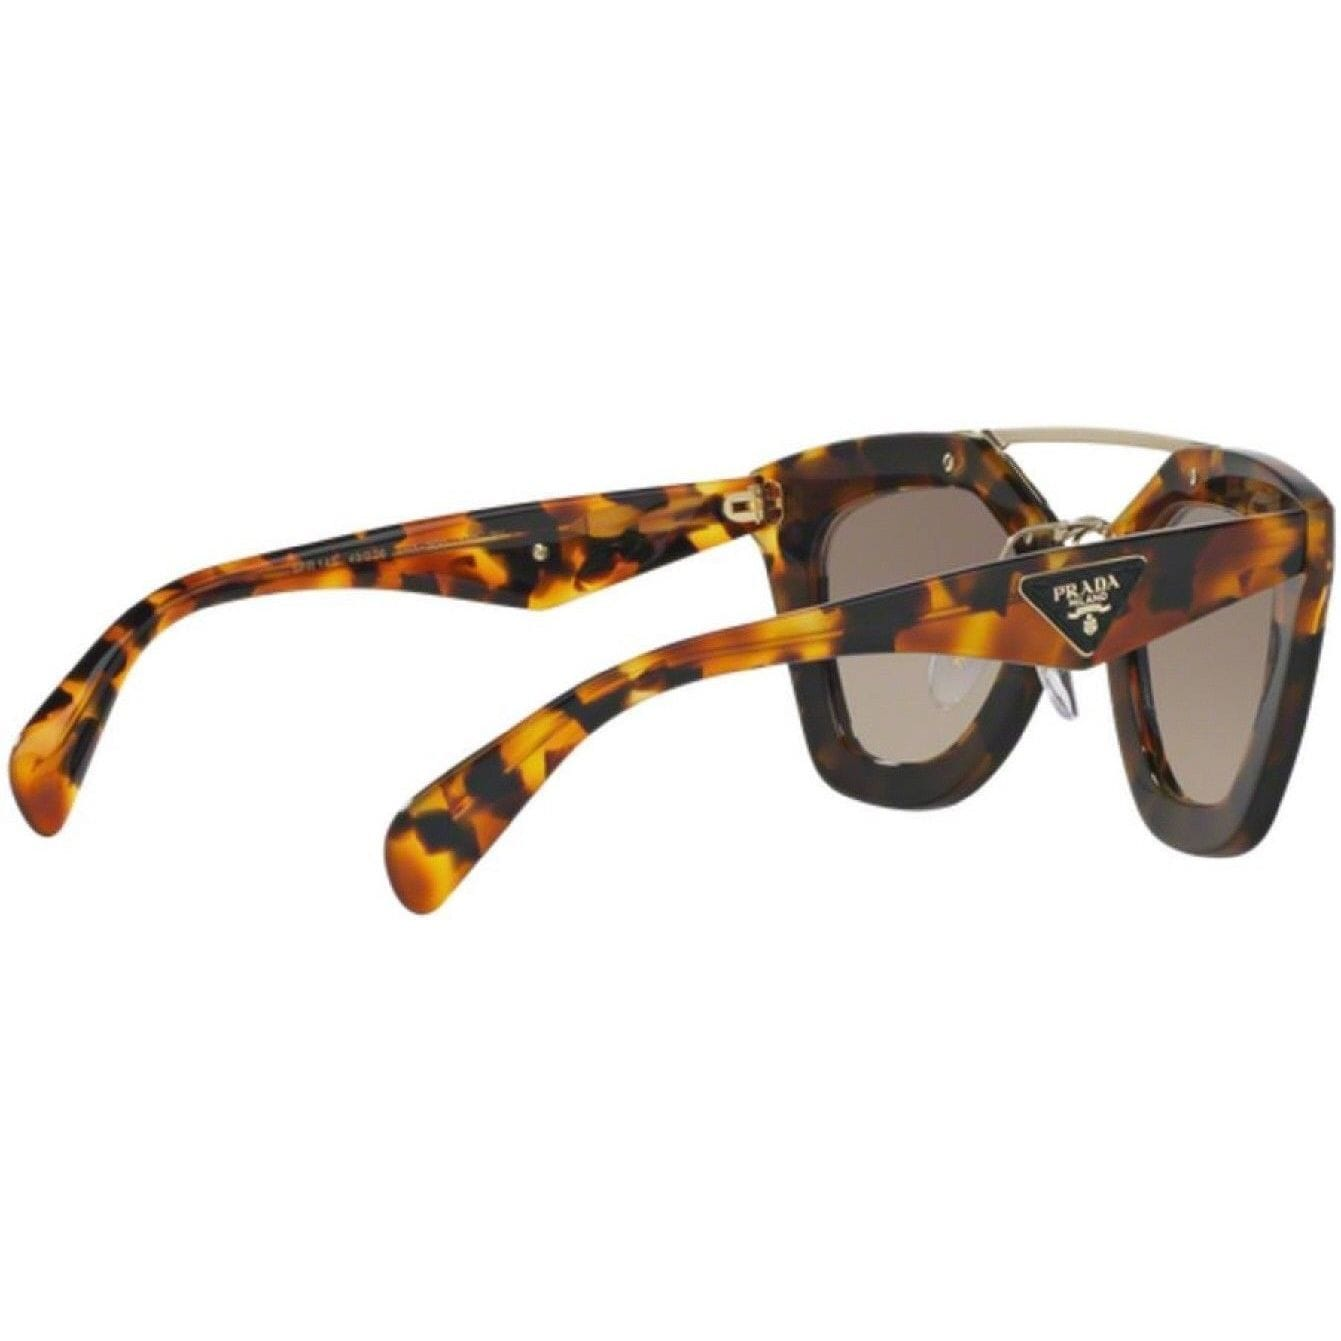 4a6b0235f35 ... low price shop prada pr 14ss vhc4ko womens havana pink leather frame  brown lens sunglasses free